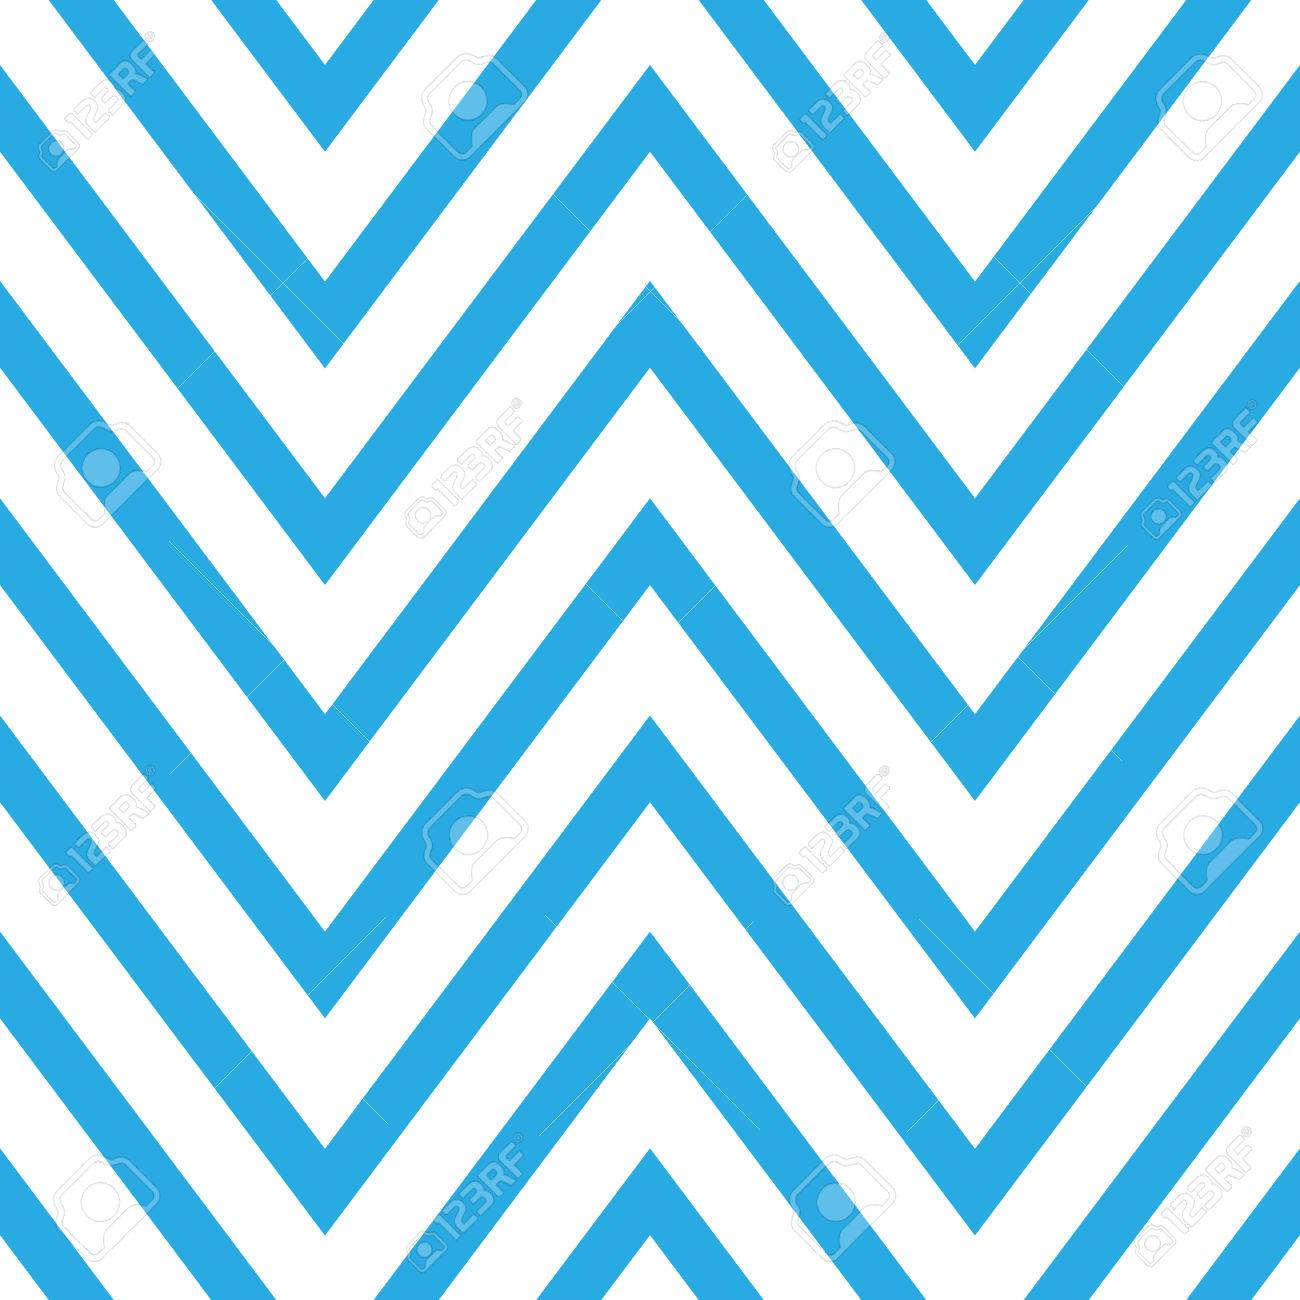 seamless chevron pattern in blue and white horizontal zigzag rh 123rf com  chevron vector pattern illustrator